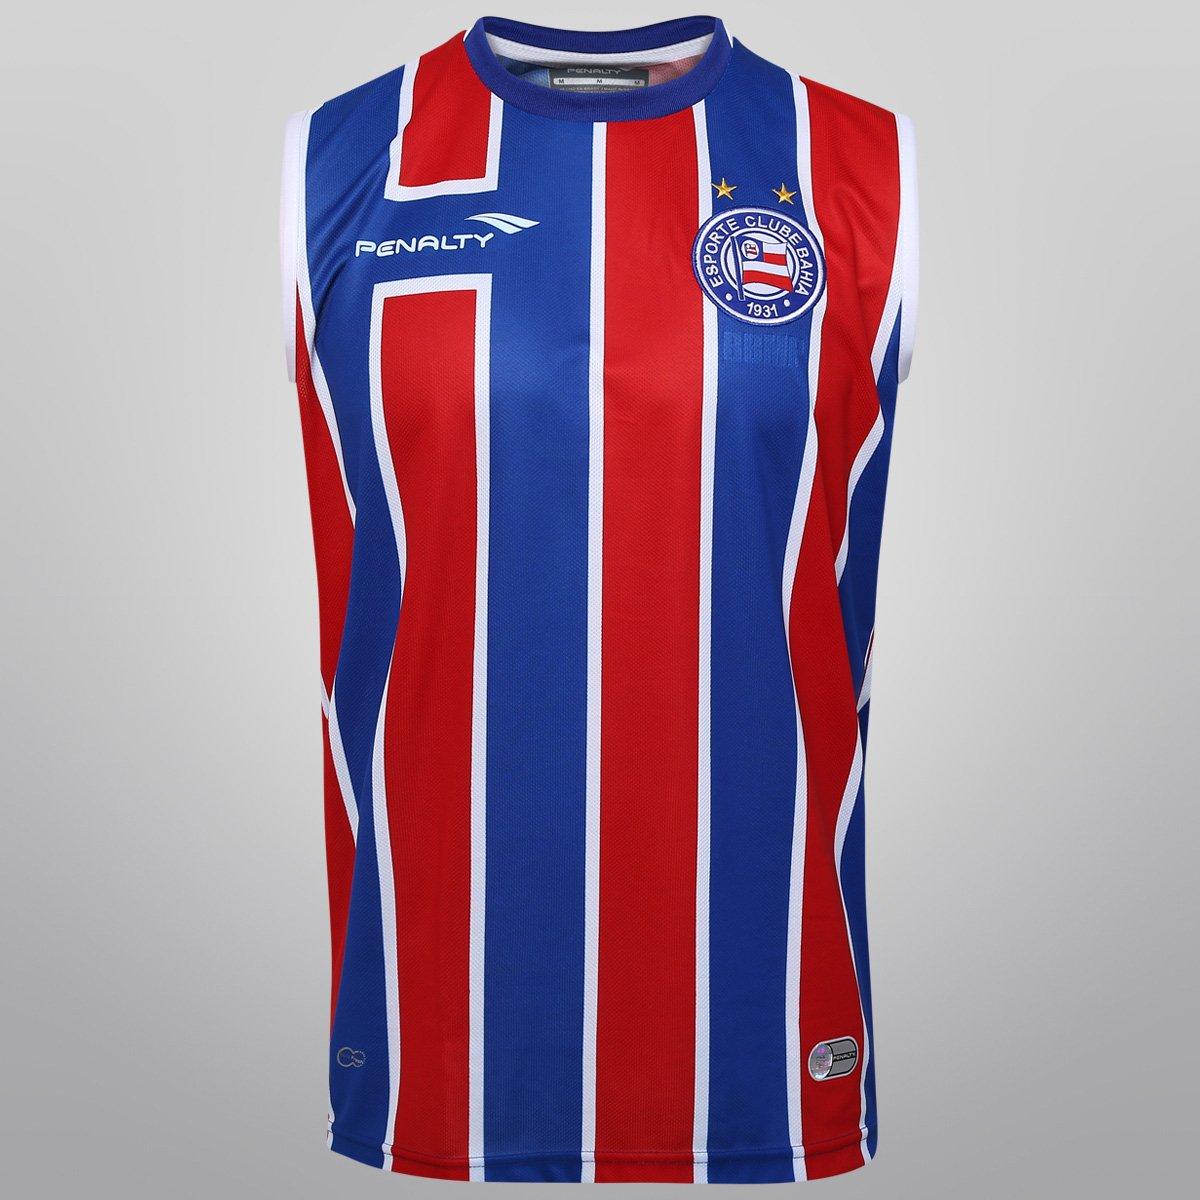 Camiseta Regata Bahia Penalty II 2015 s nº Masculina - Compre Agora ... e3c4004870749